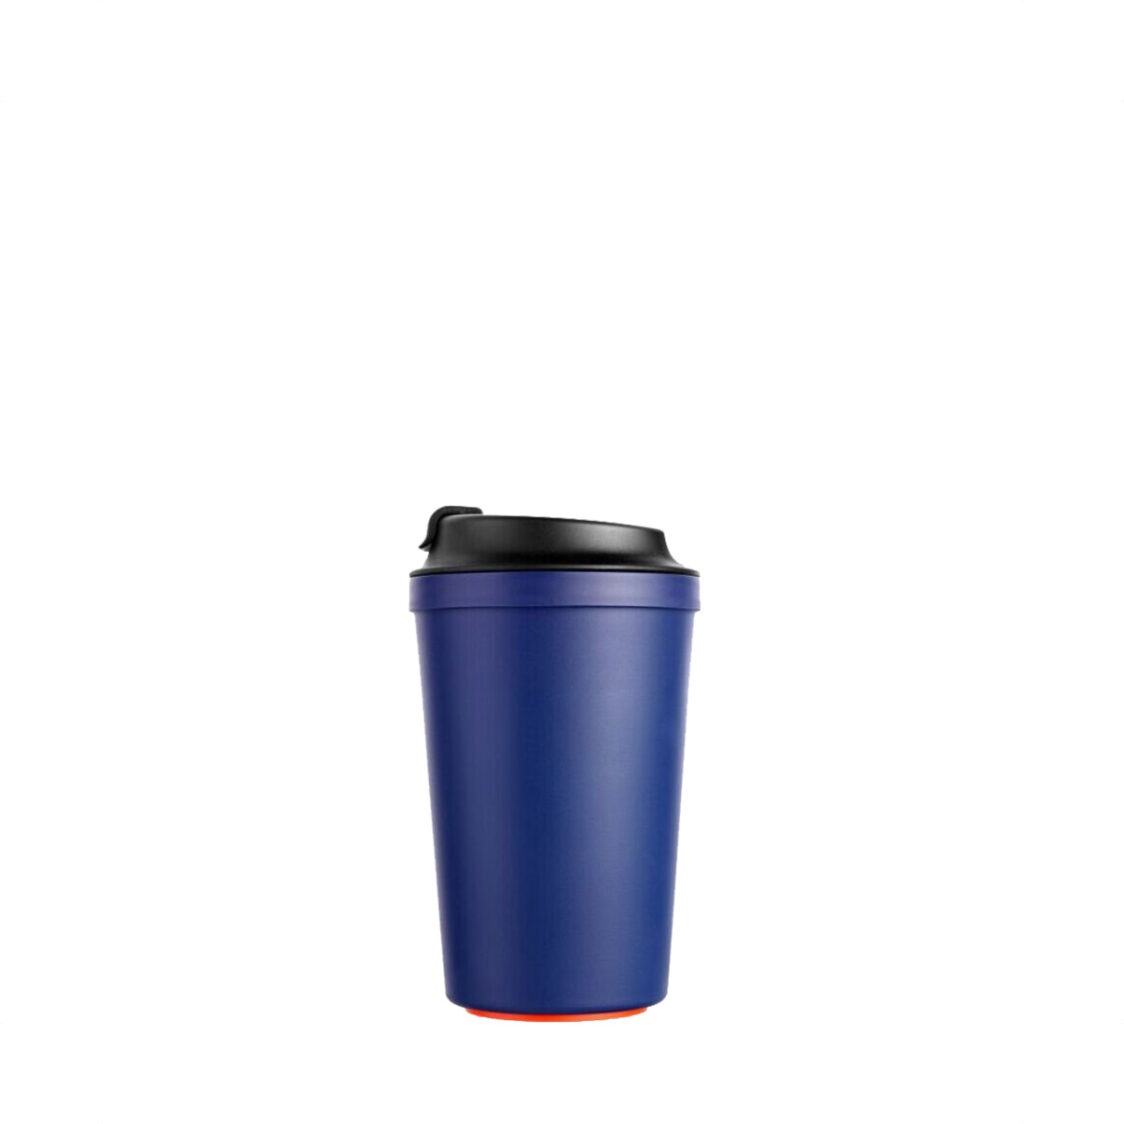 Artiart Suction Idea Caf Mug Dark Blue 340ml